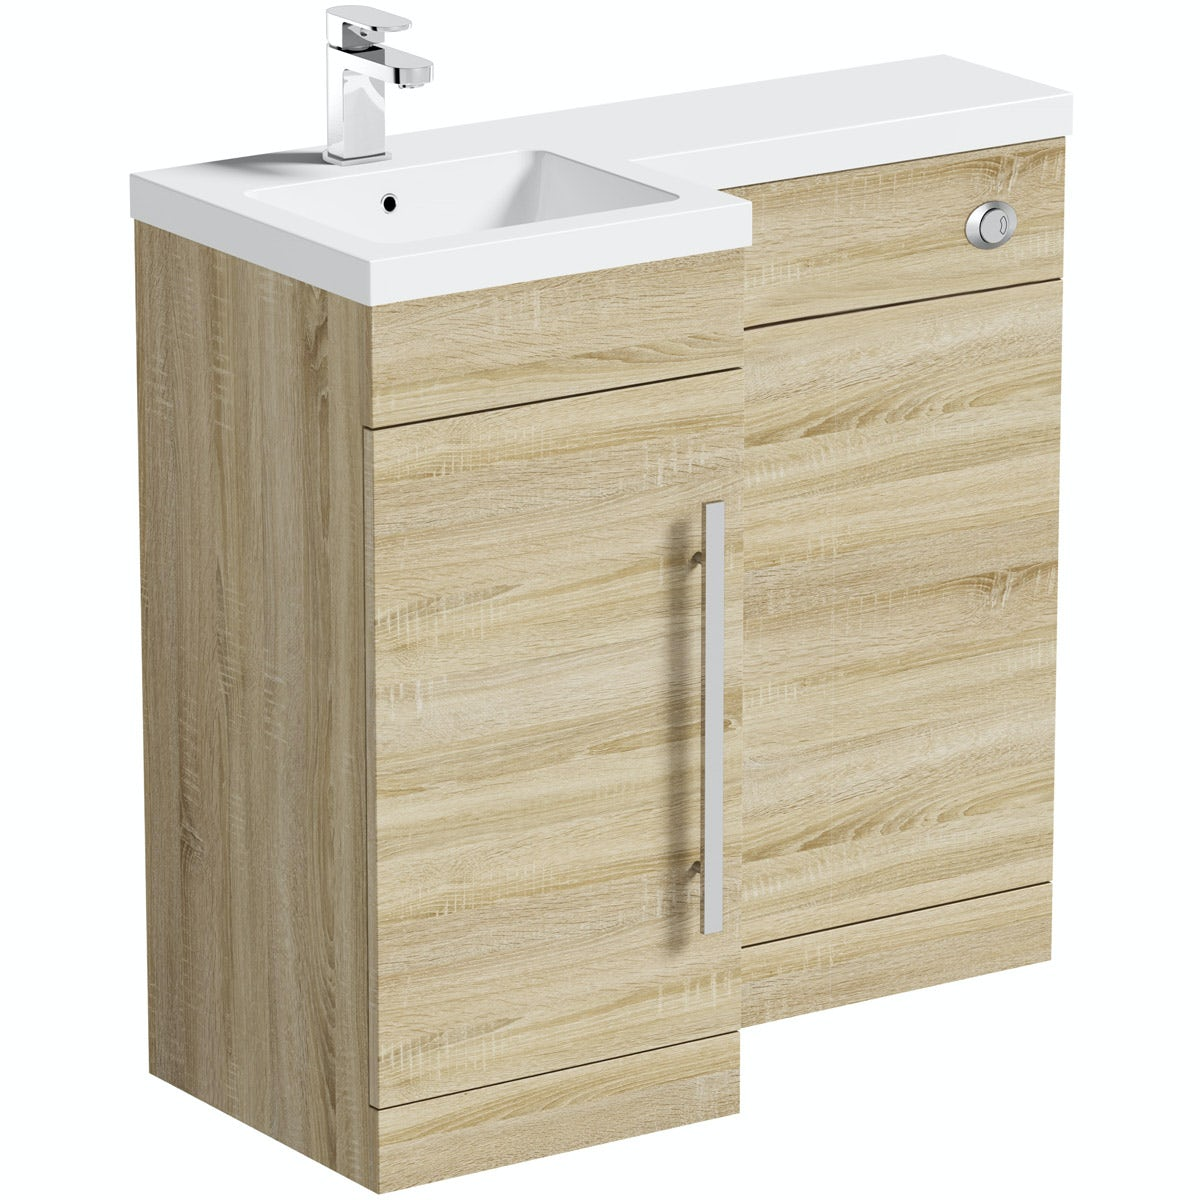 MySpace Oak Combination Unit LH including Concealed Cistern